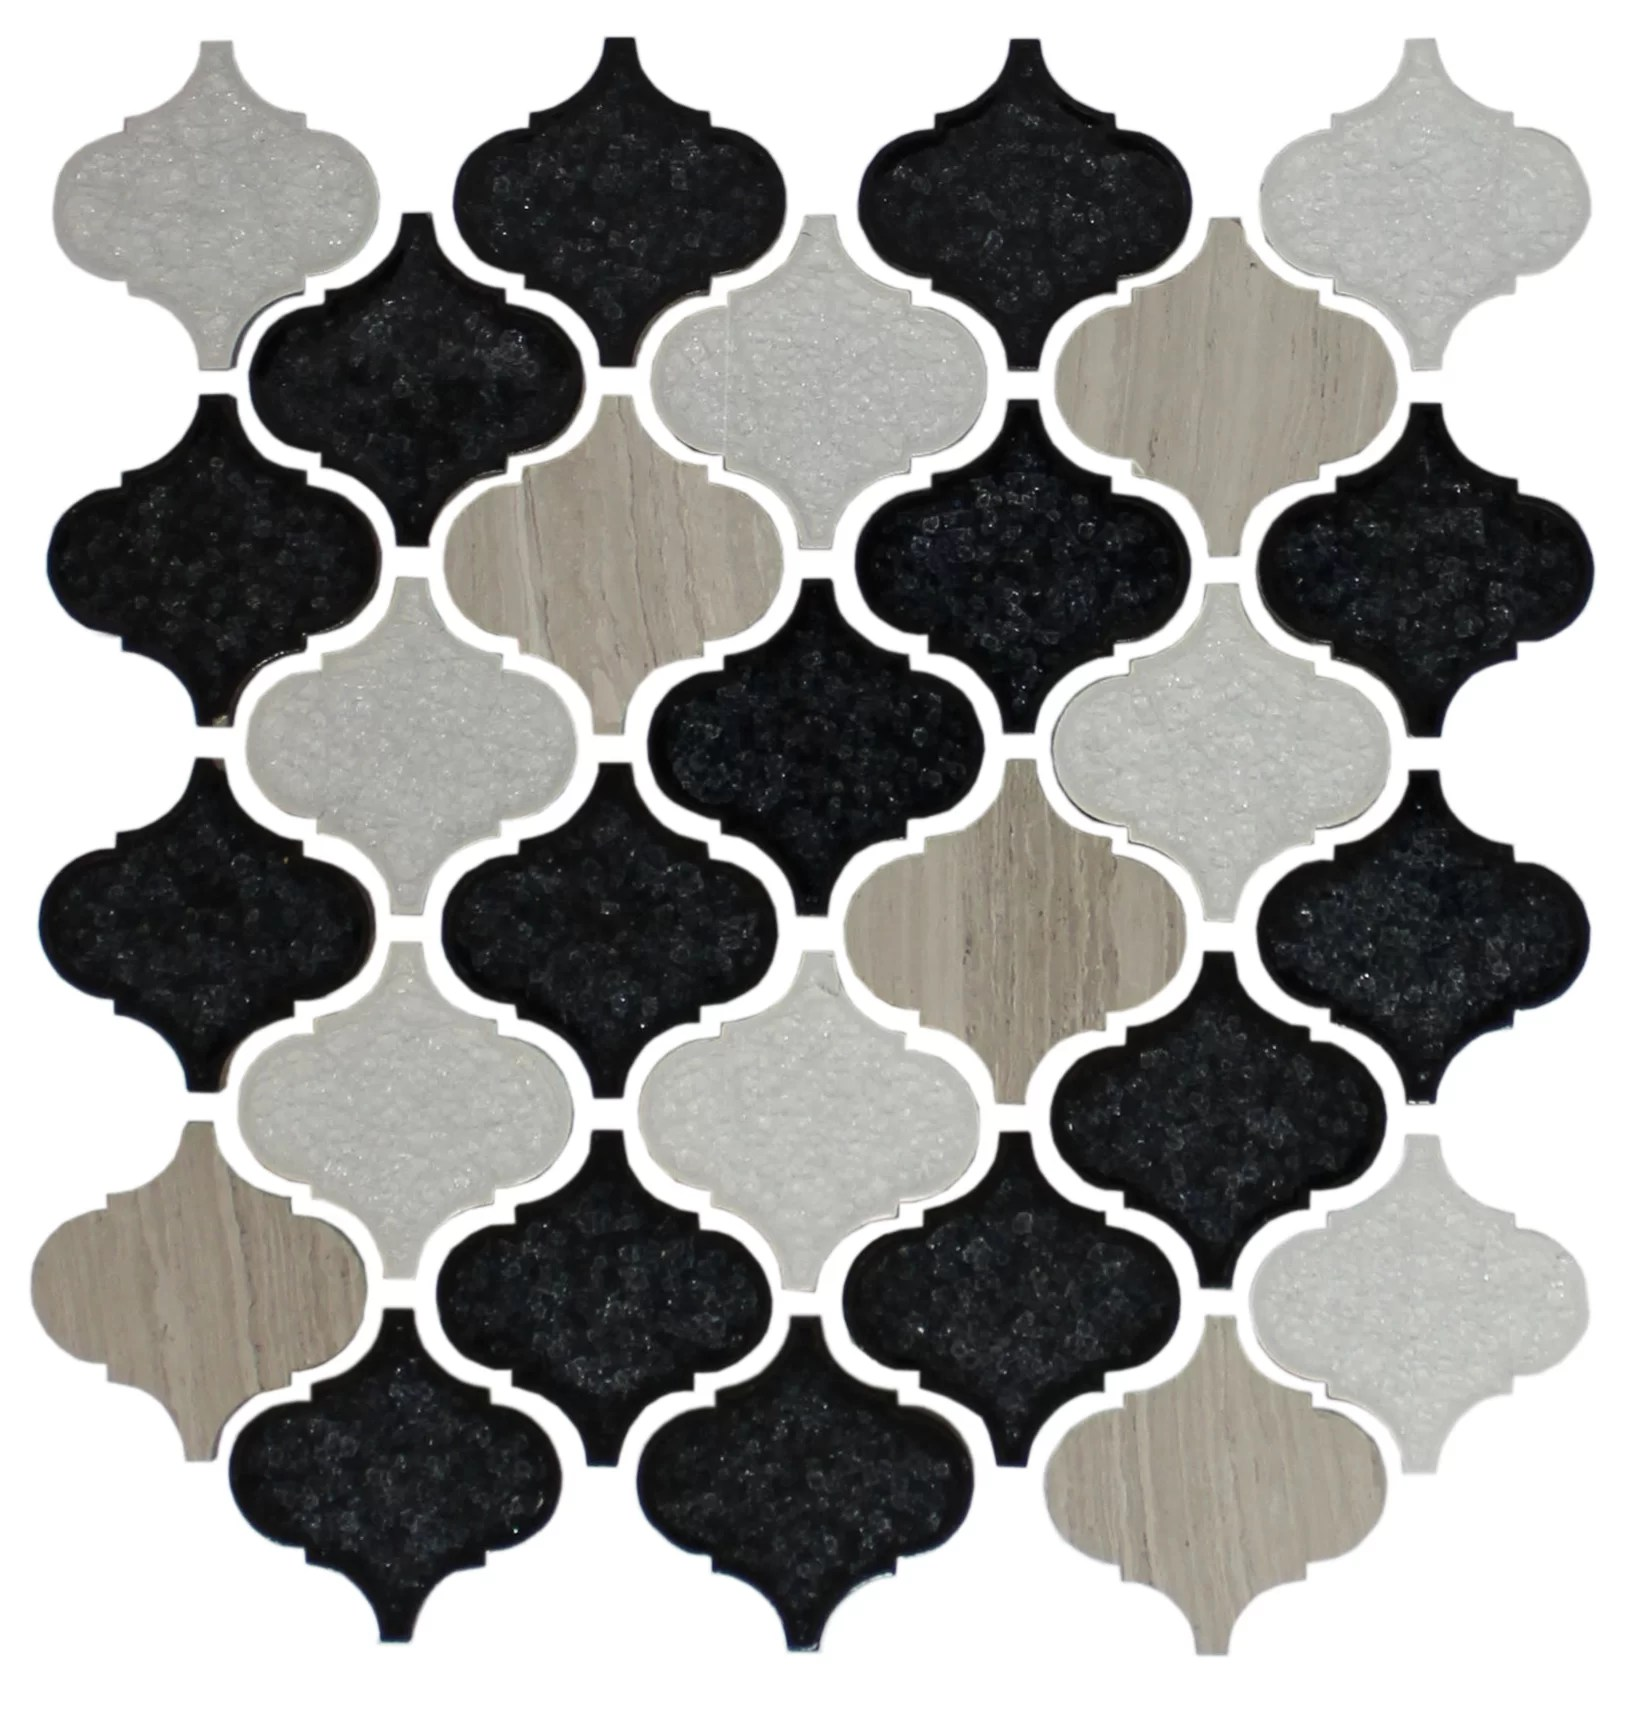 lemannville teardrop random sized glass mosaic tile in white black